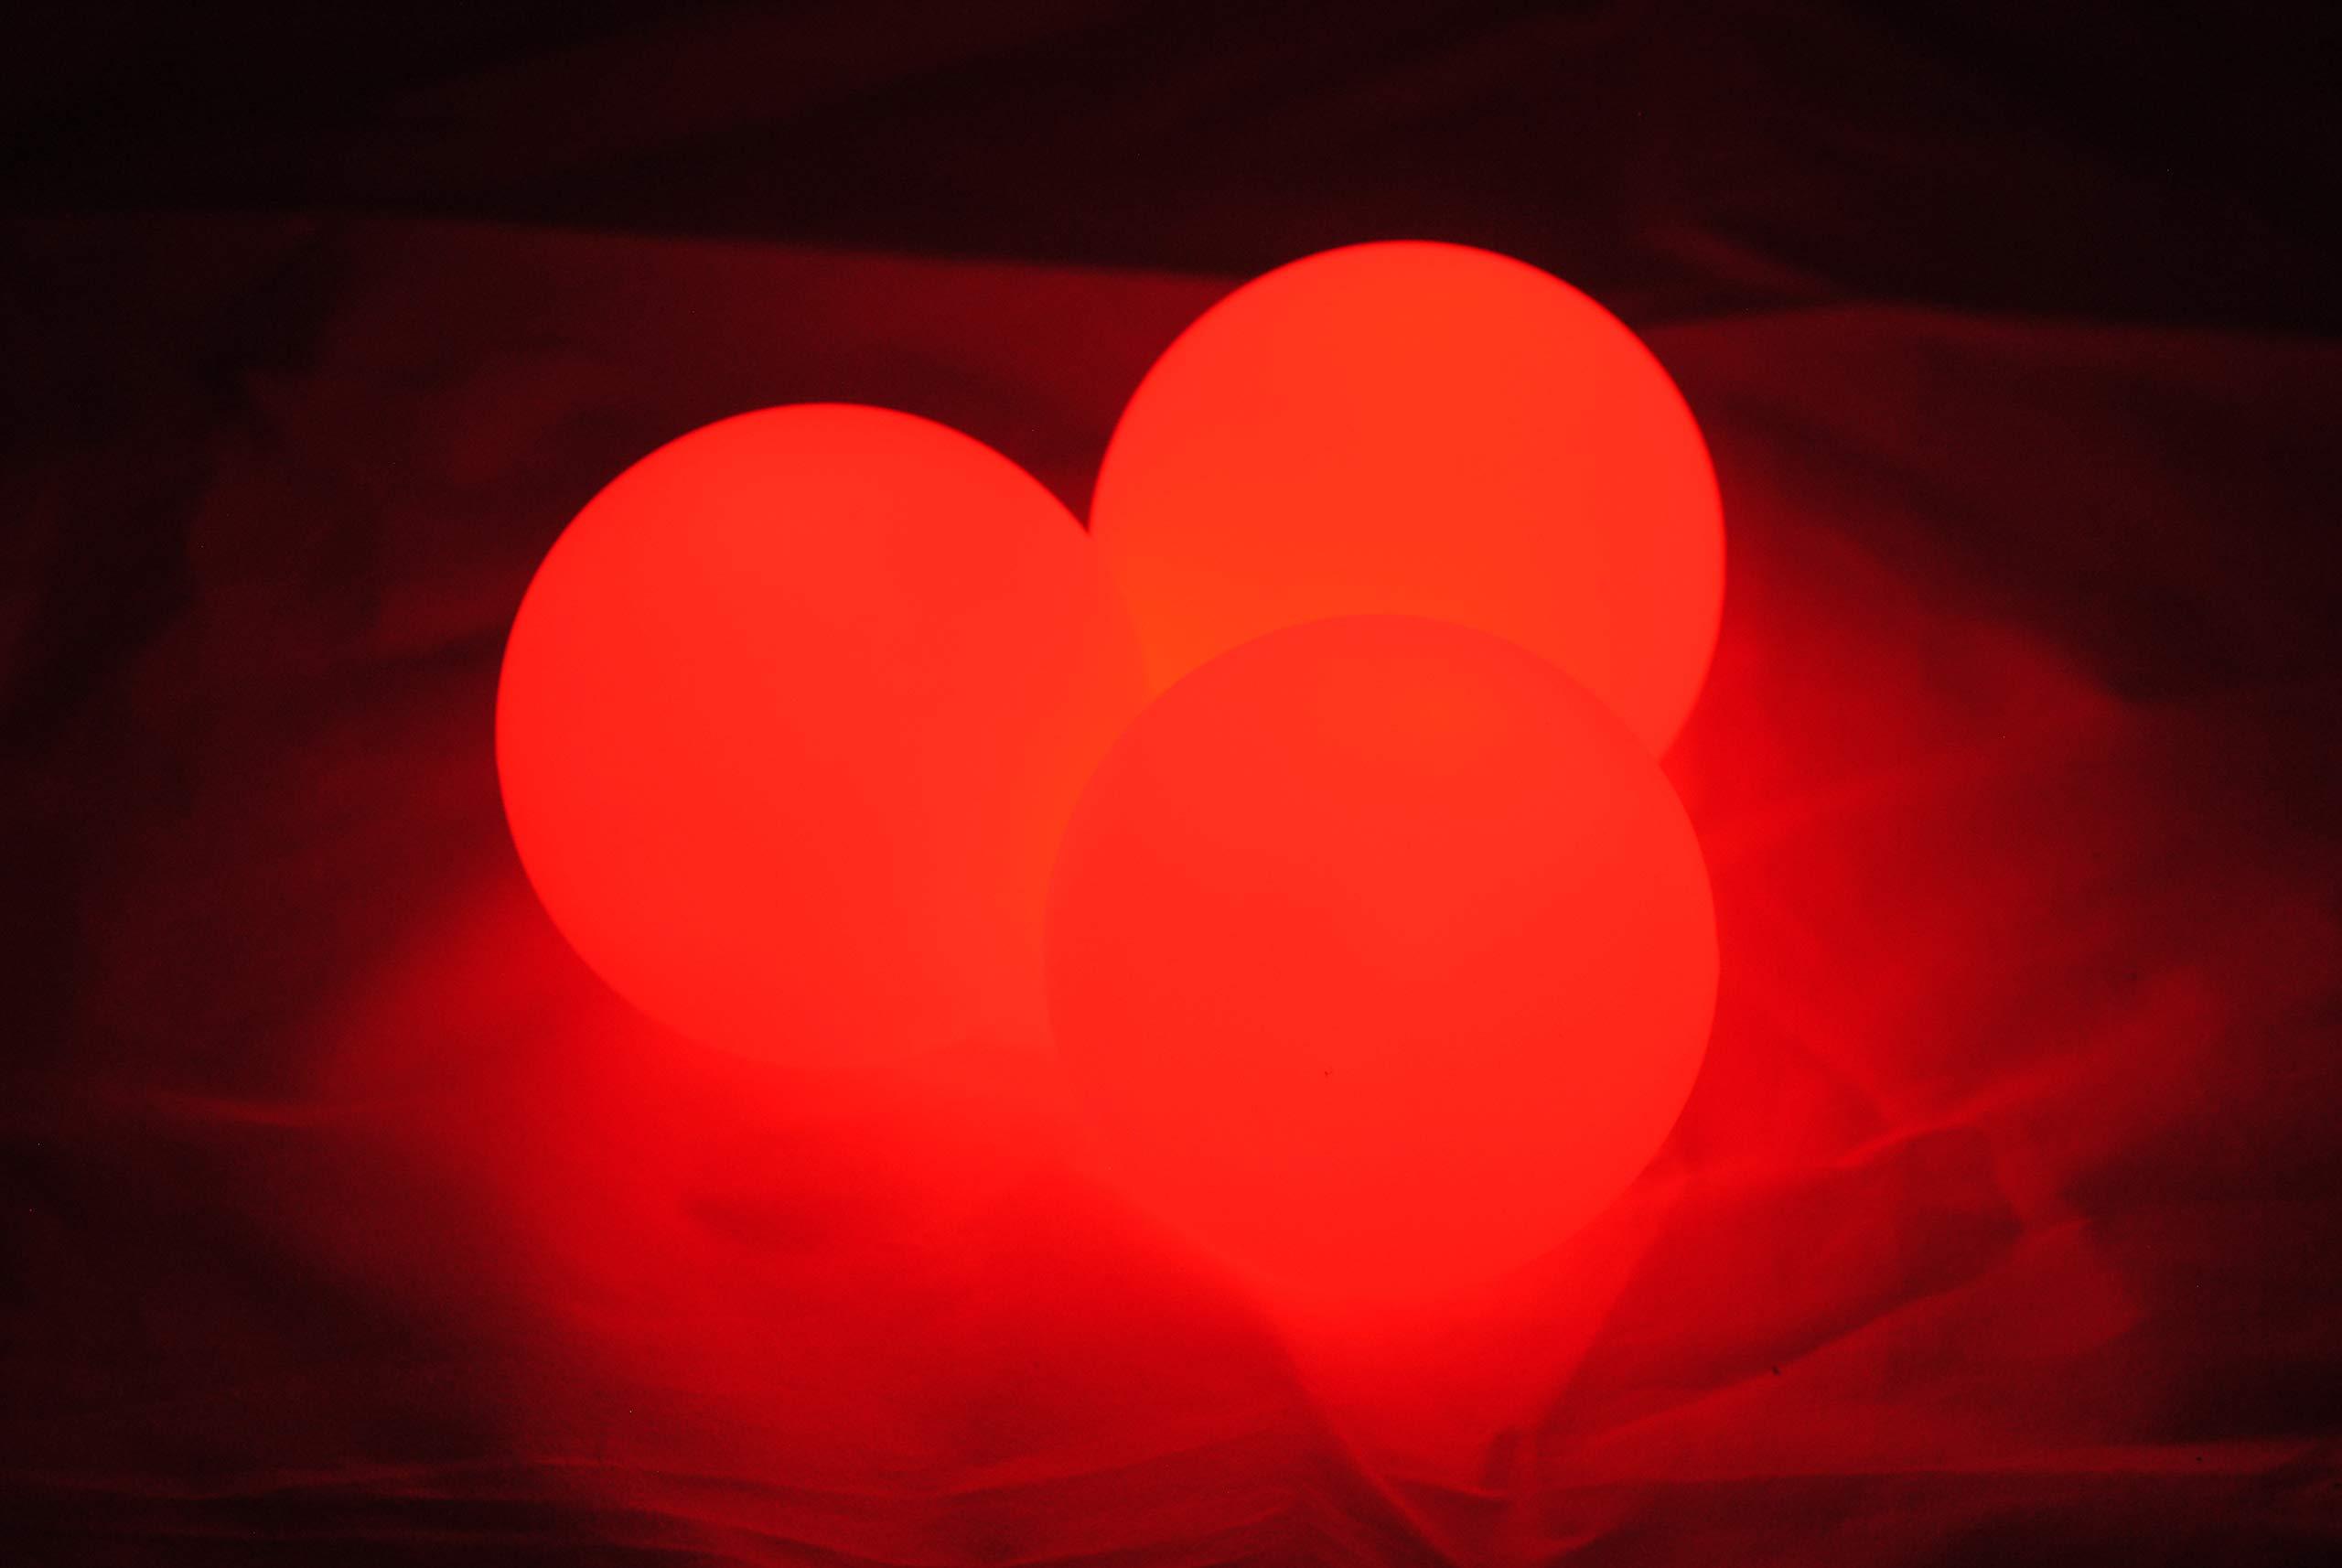 Higgins Brothers Luster LED Light-Up Juggling Balls (Red) by Higgins Brothers